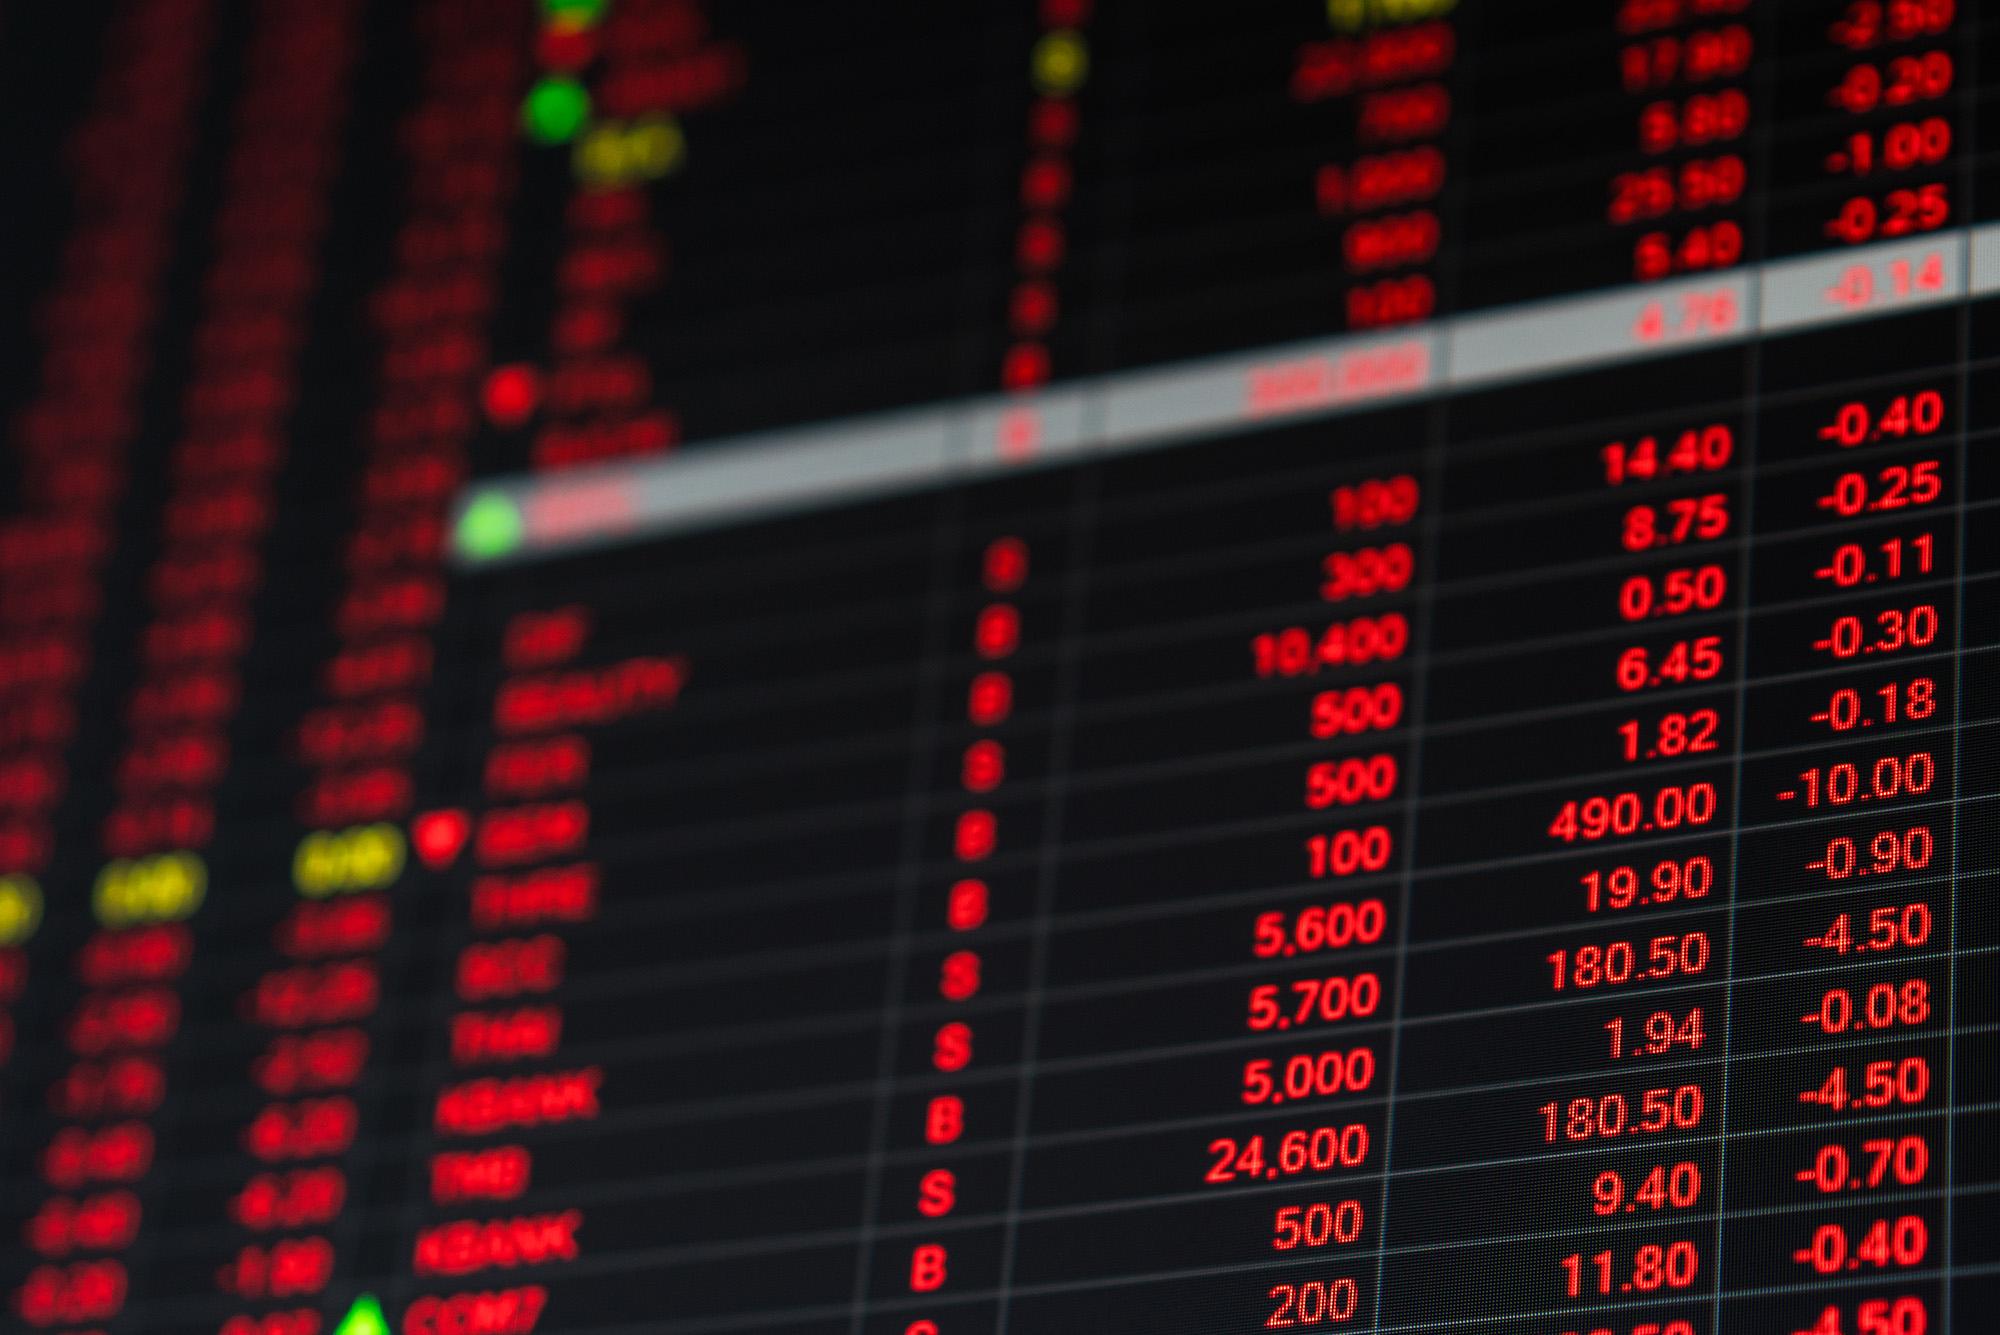 JPMorgan Says It's Finally Time to Buy Stocks Despite Trade